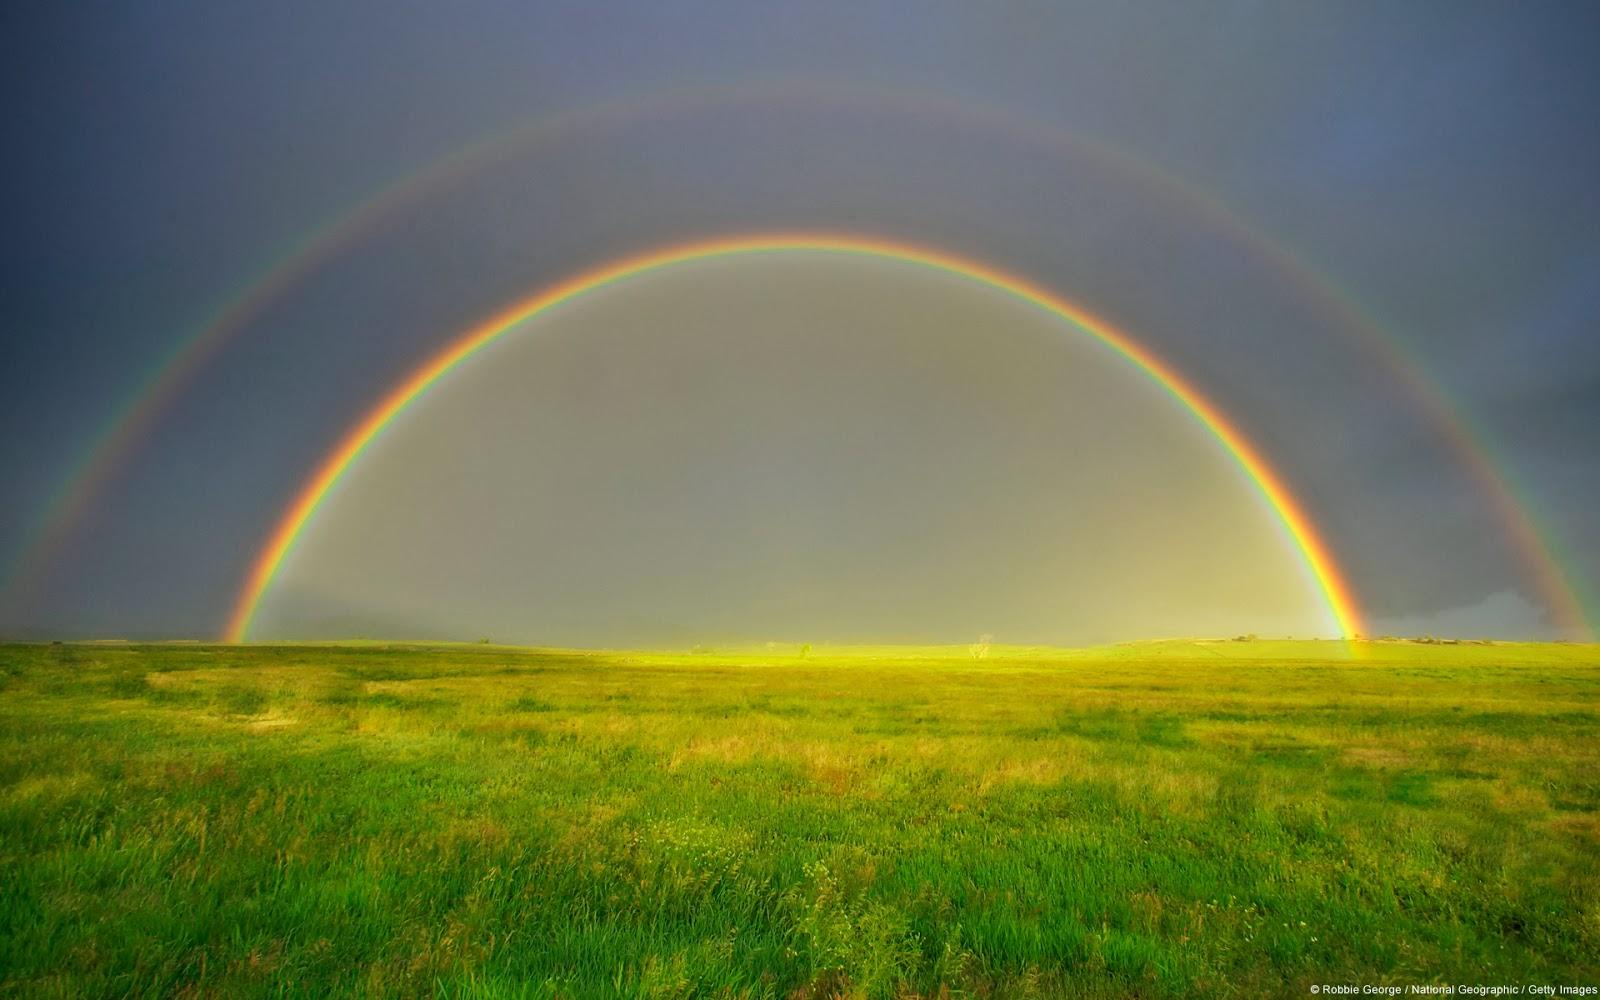 9. Awesome Rainbow | Awsome Pics